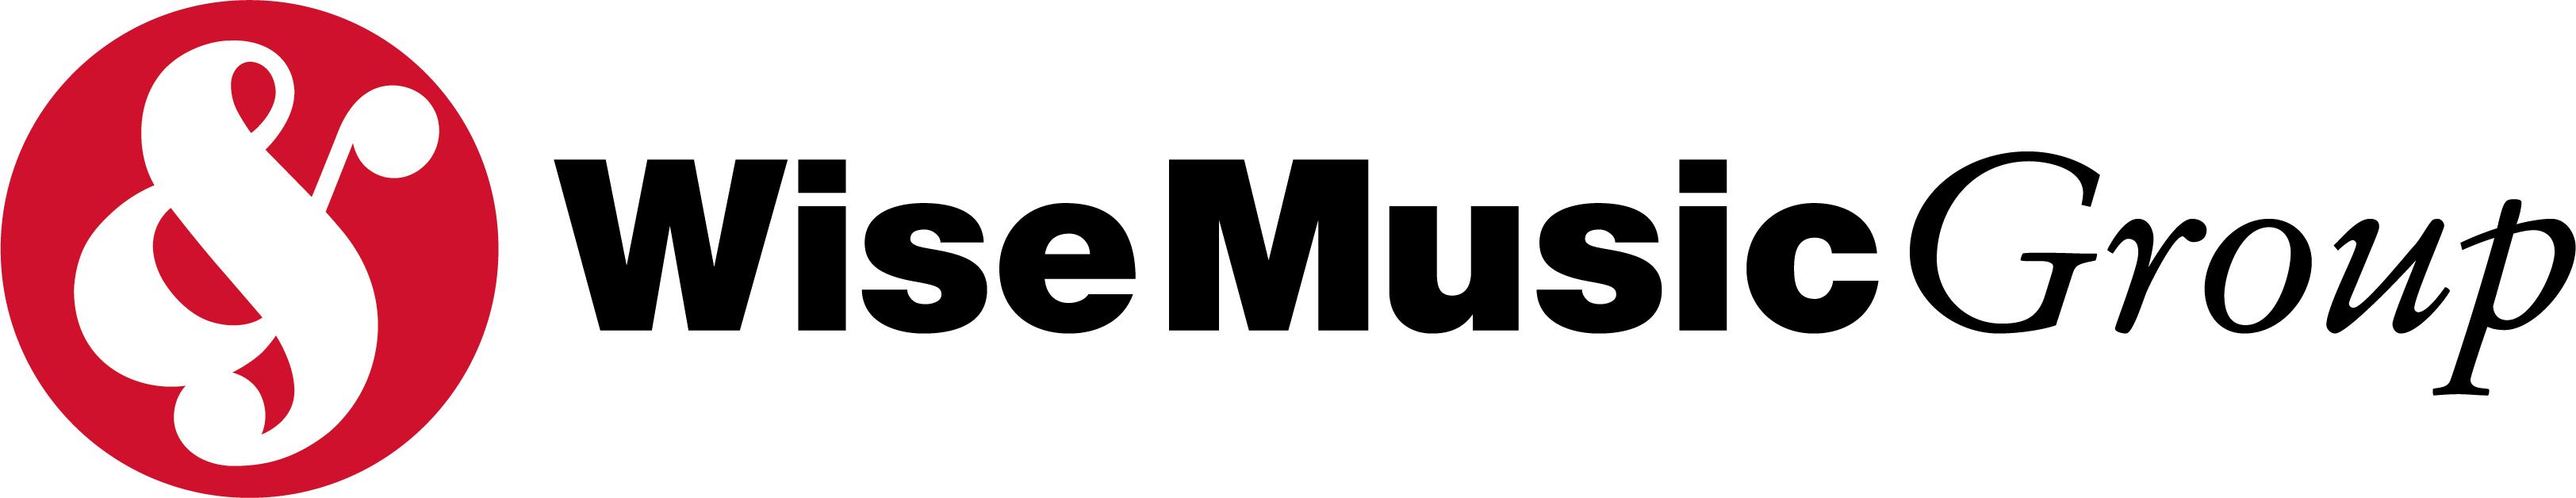 Wise Music Group logo